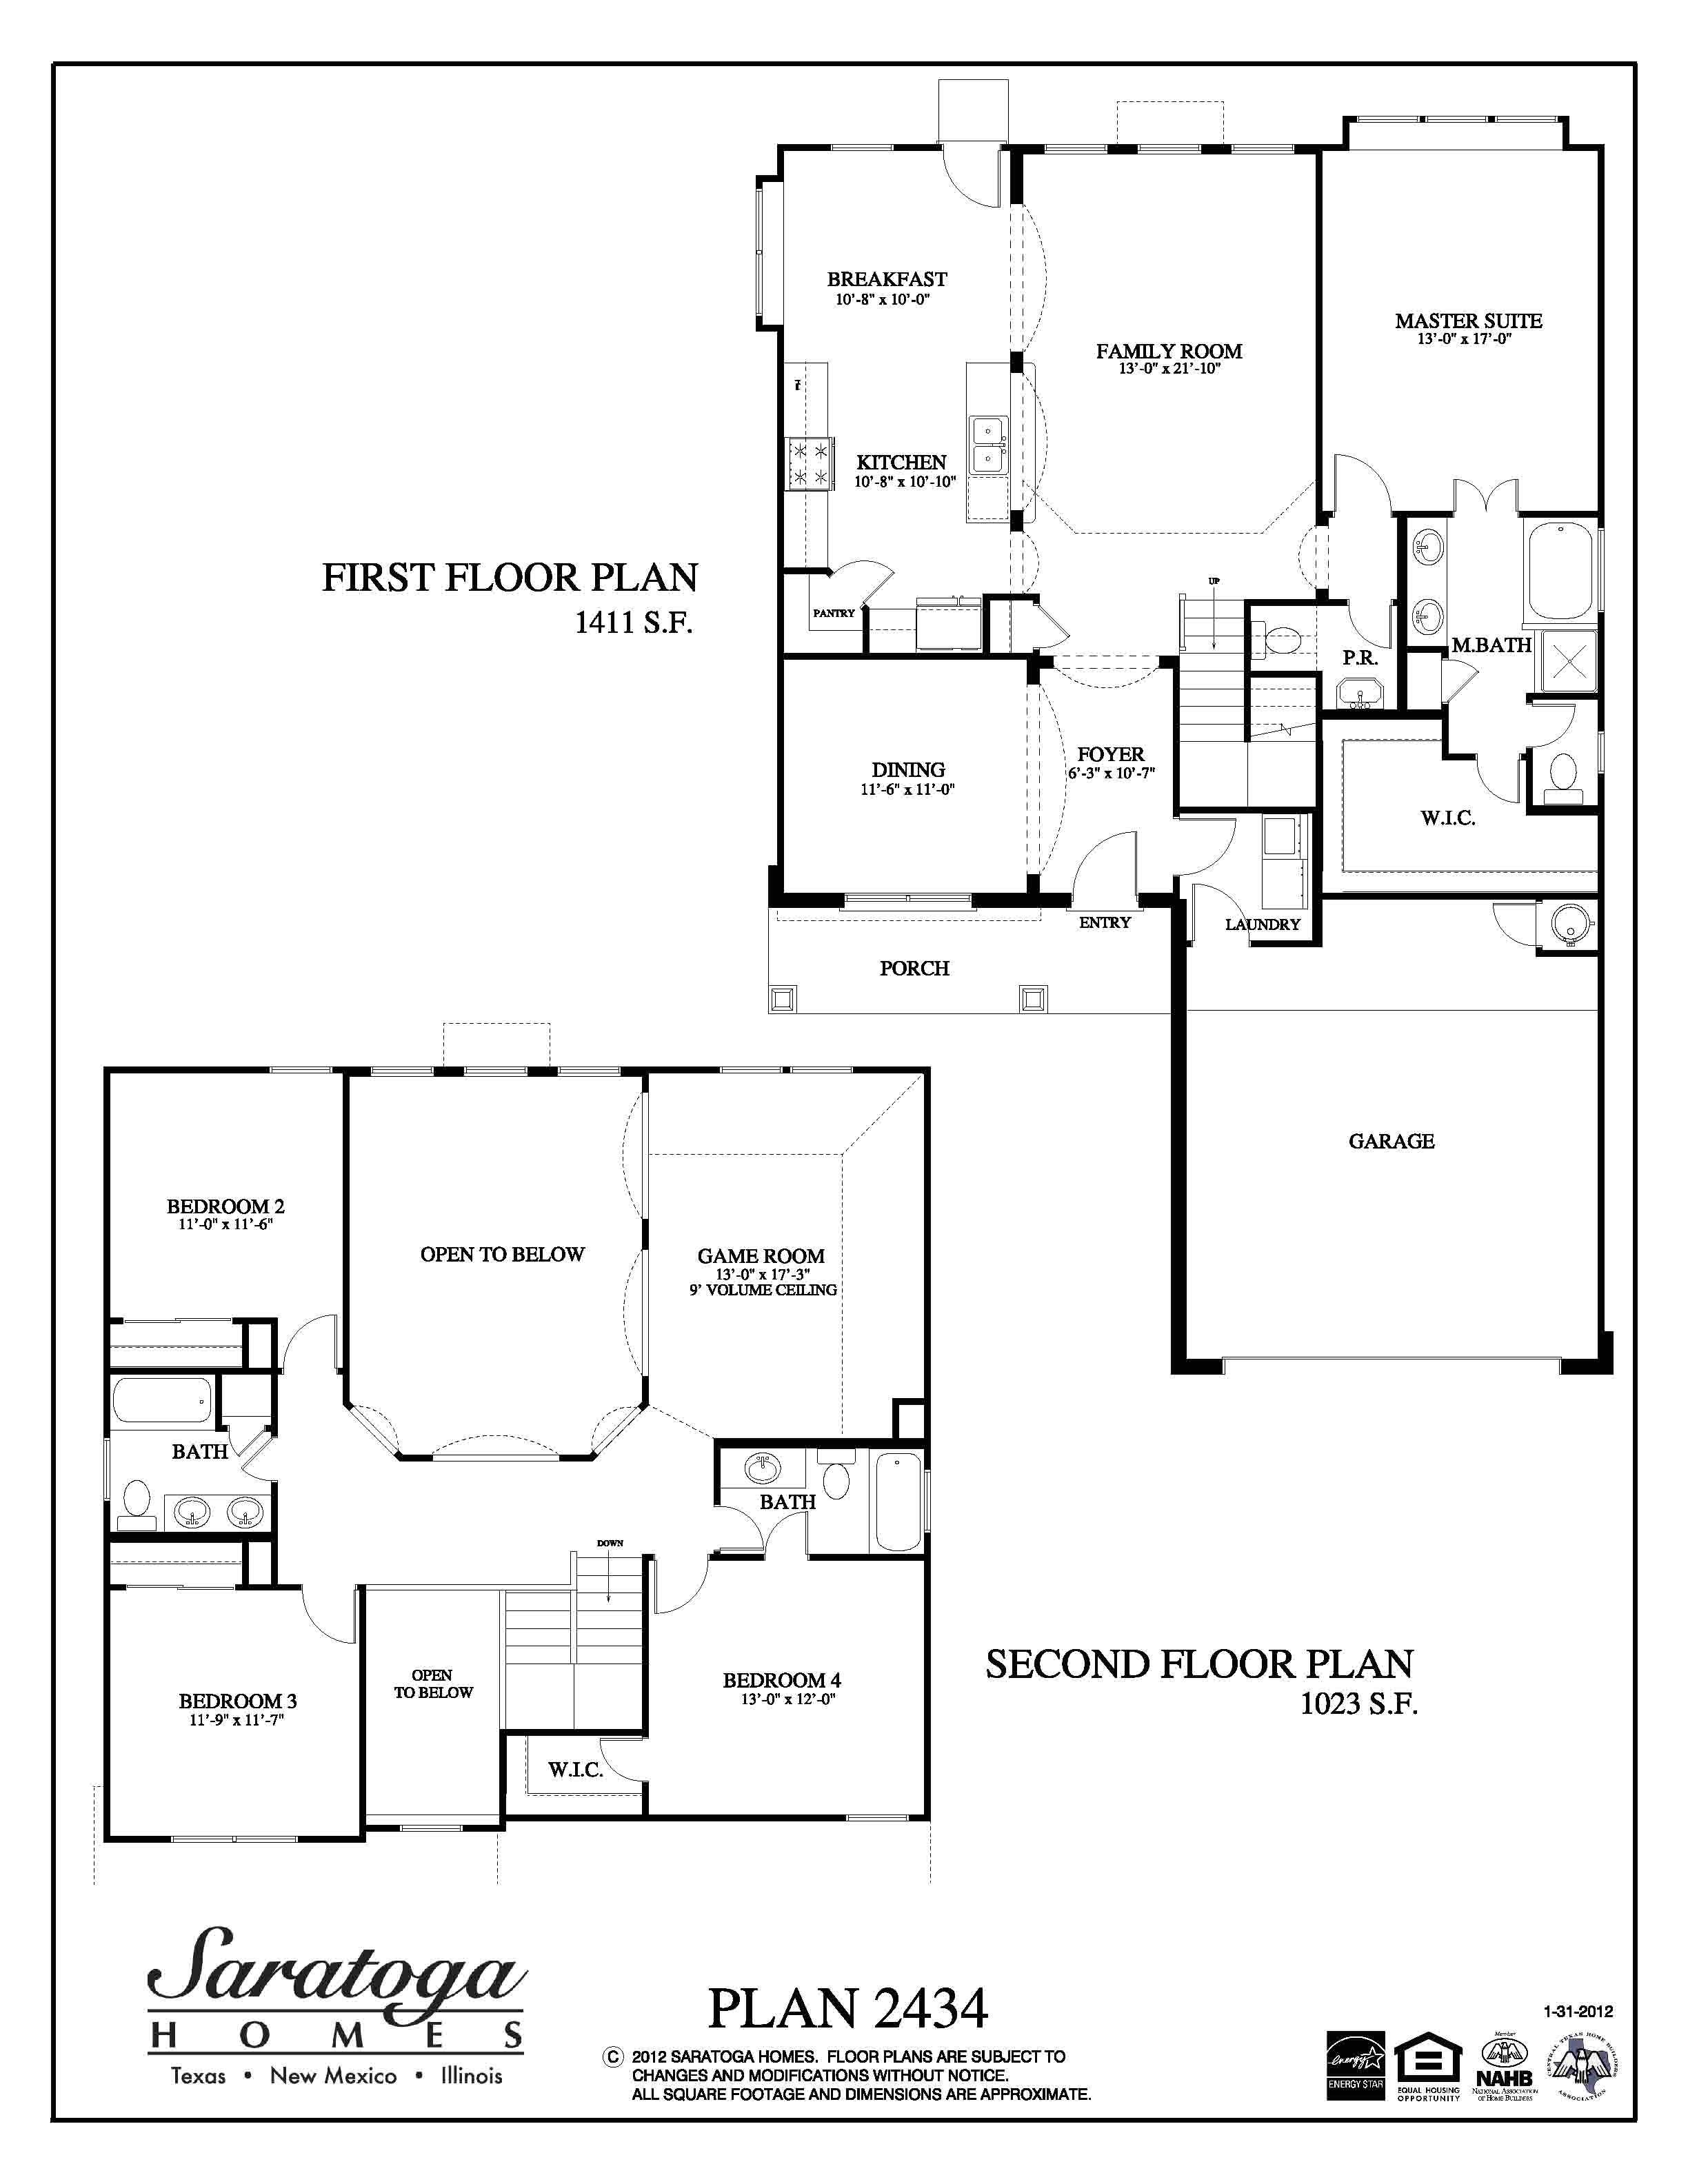 Saratoga Homes Floor Plans Plan 2434 Saratoga Homes Houston